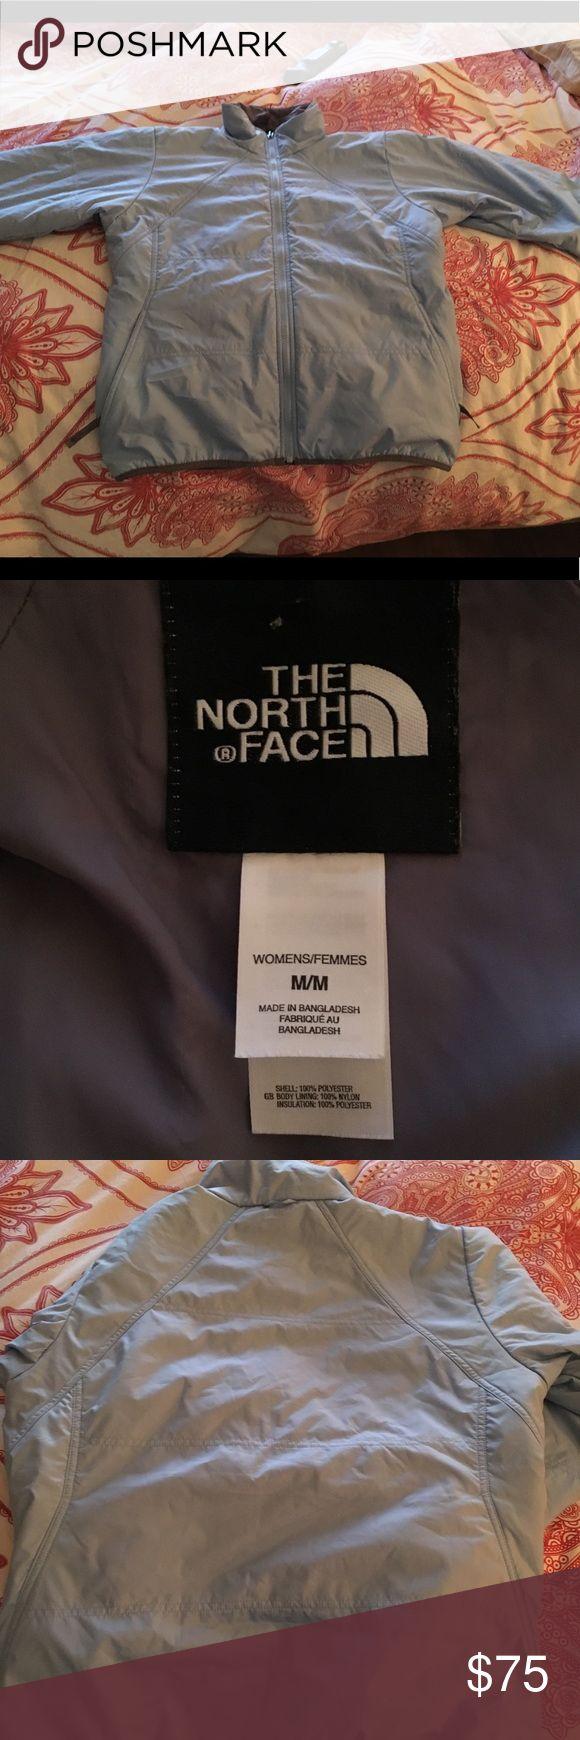 North Face light blue jacket A warm, light weight down North Face jacket. Light blue in color. Size medium. Worn once. North Face Jackets & Coats